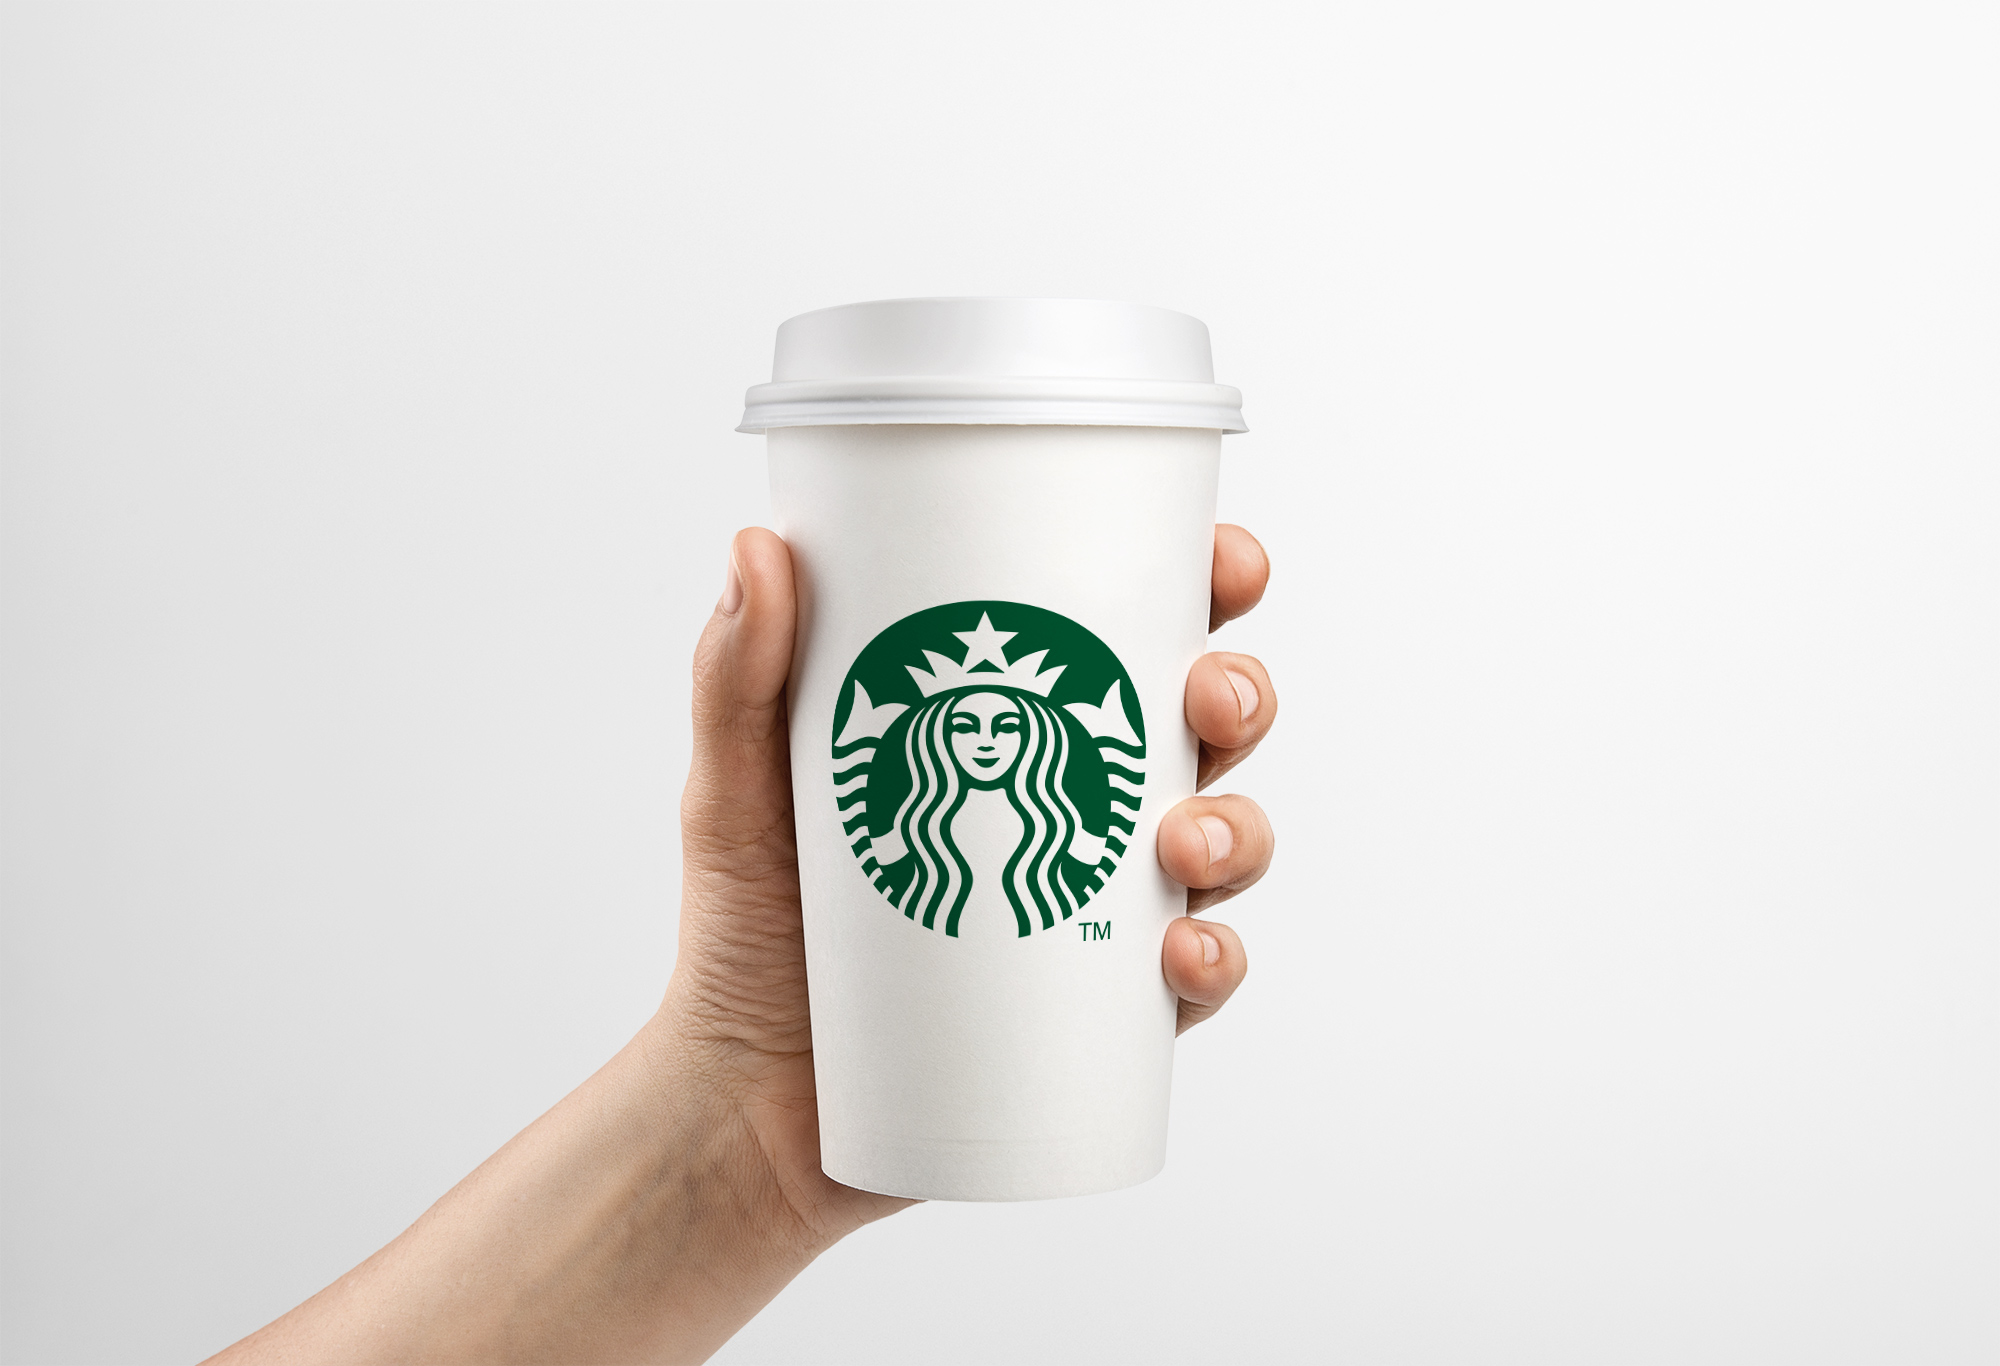 Starbucks-coffee-cup.jpg